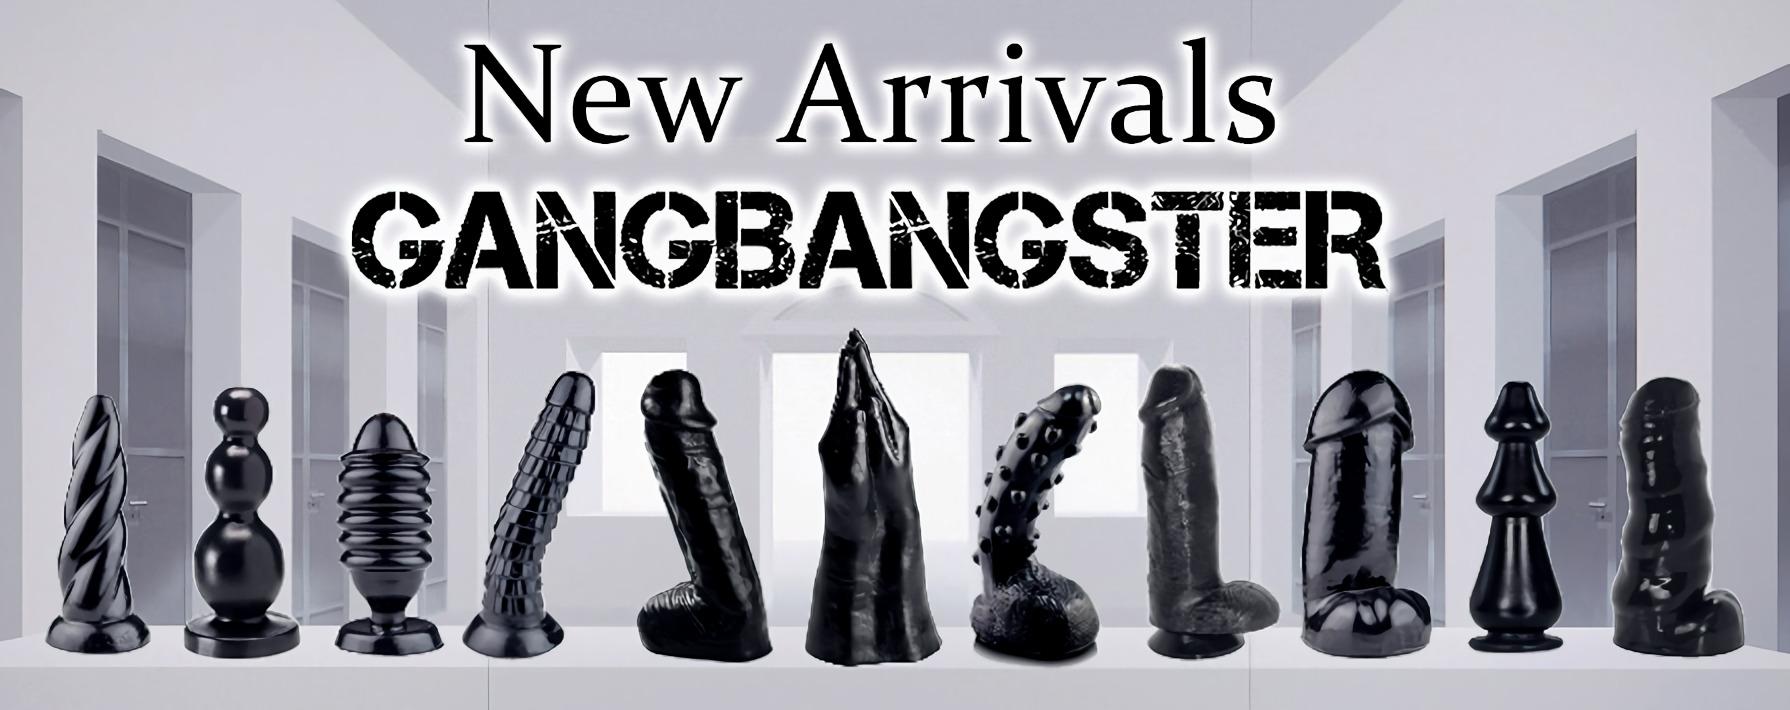 Gangbangster - New arrivals